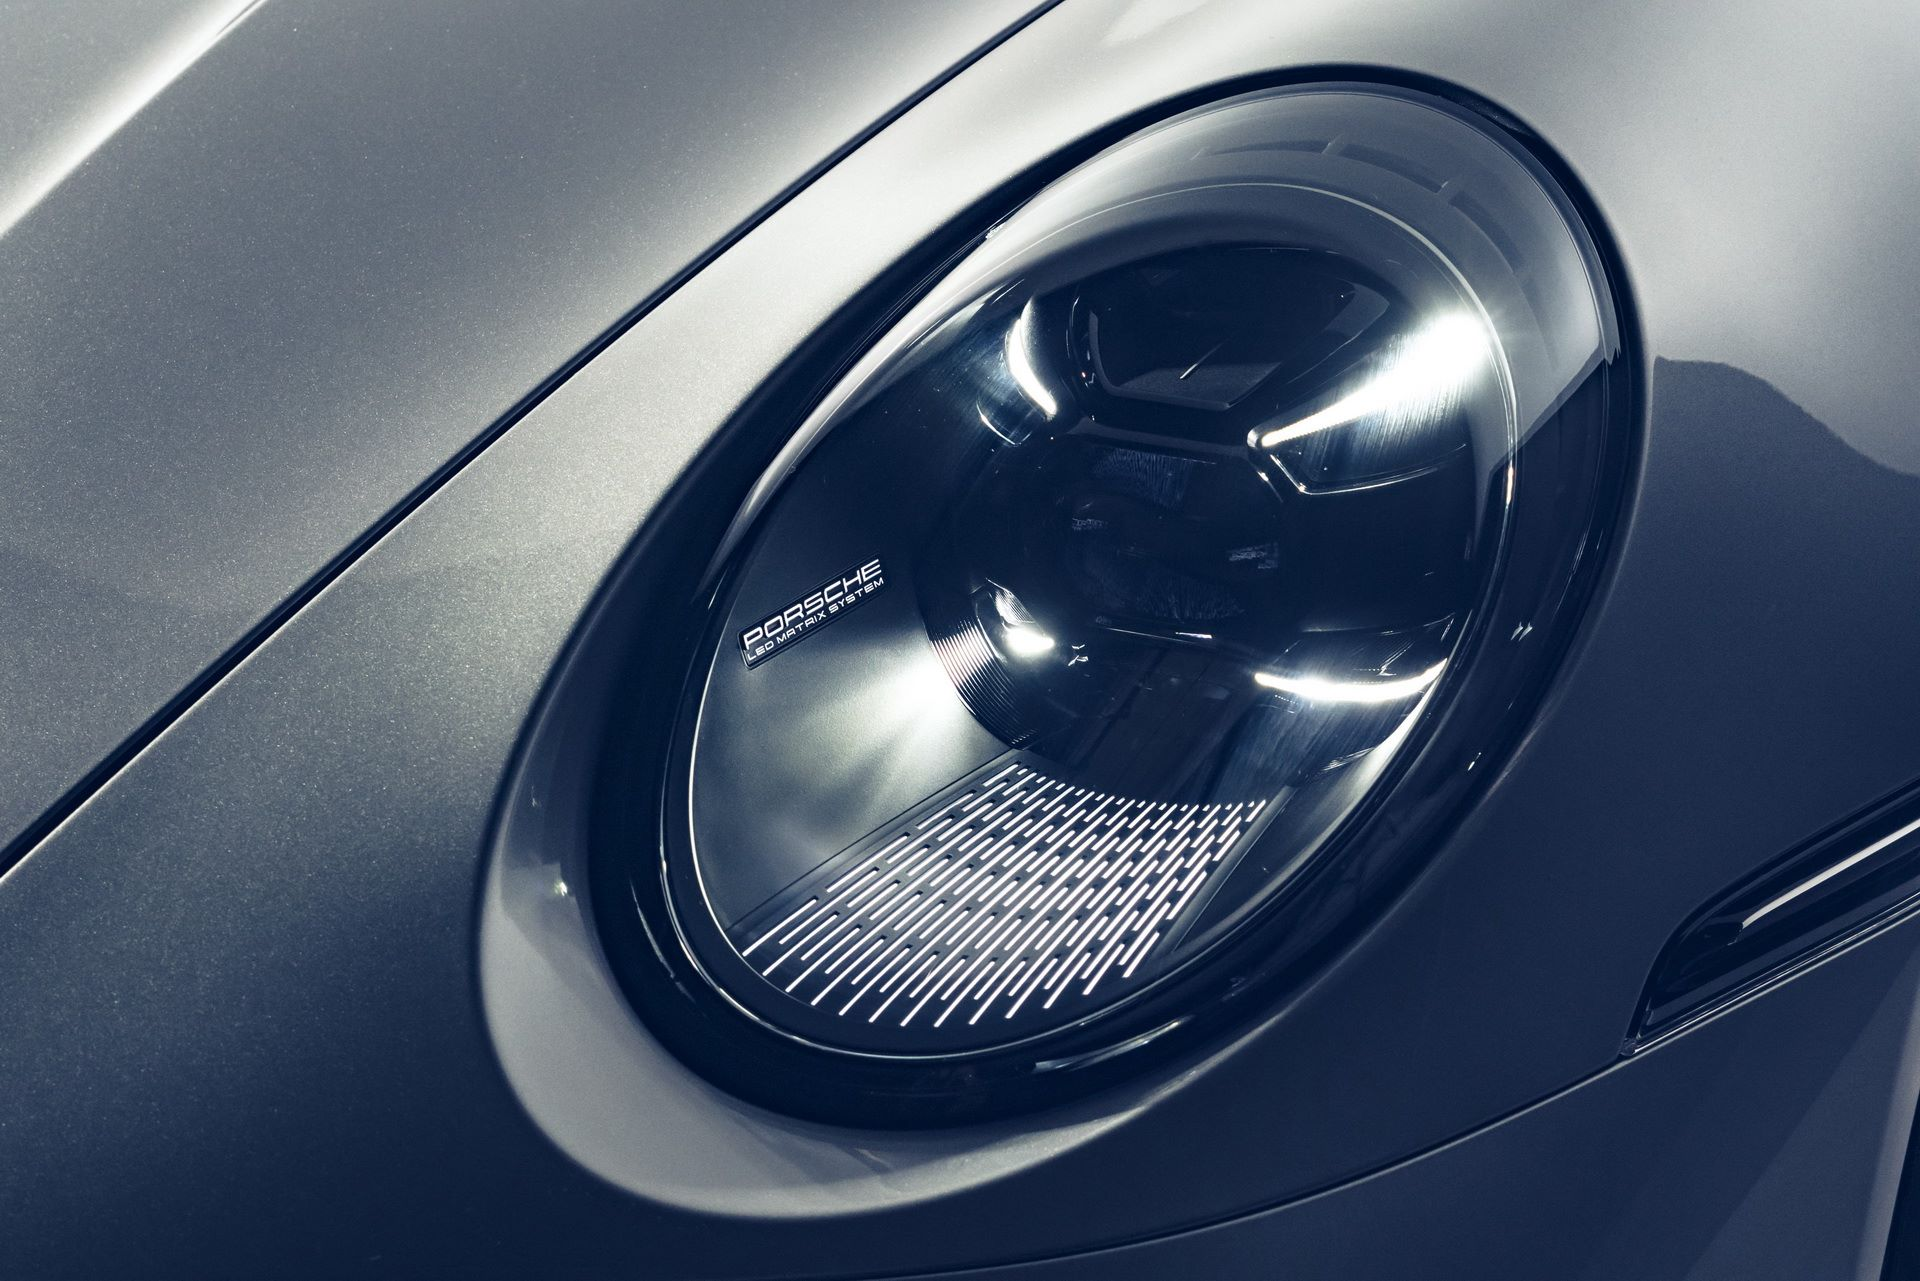 Porsche-911-Turbo-S-2020-55